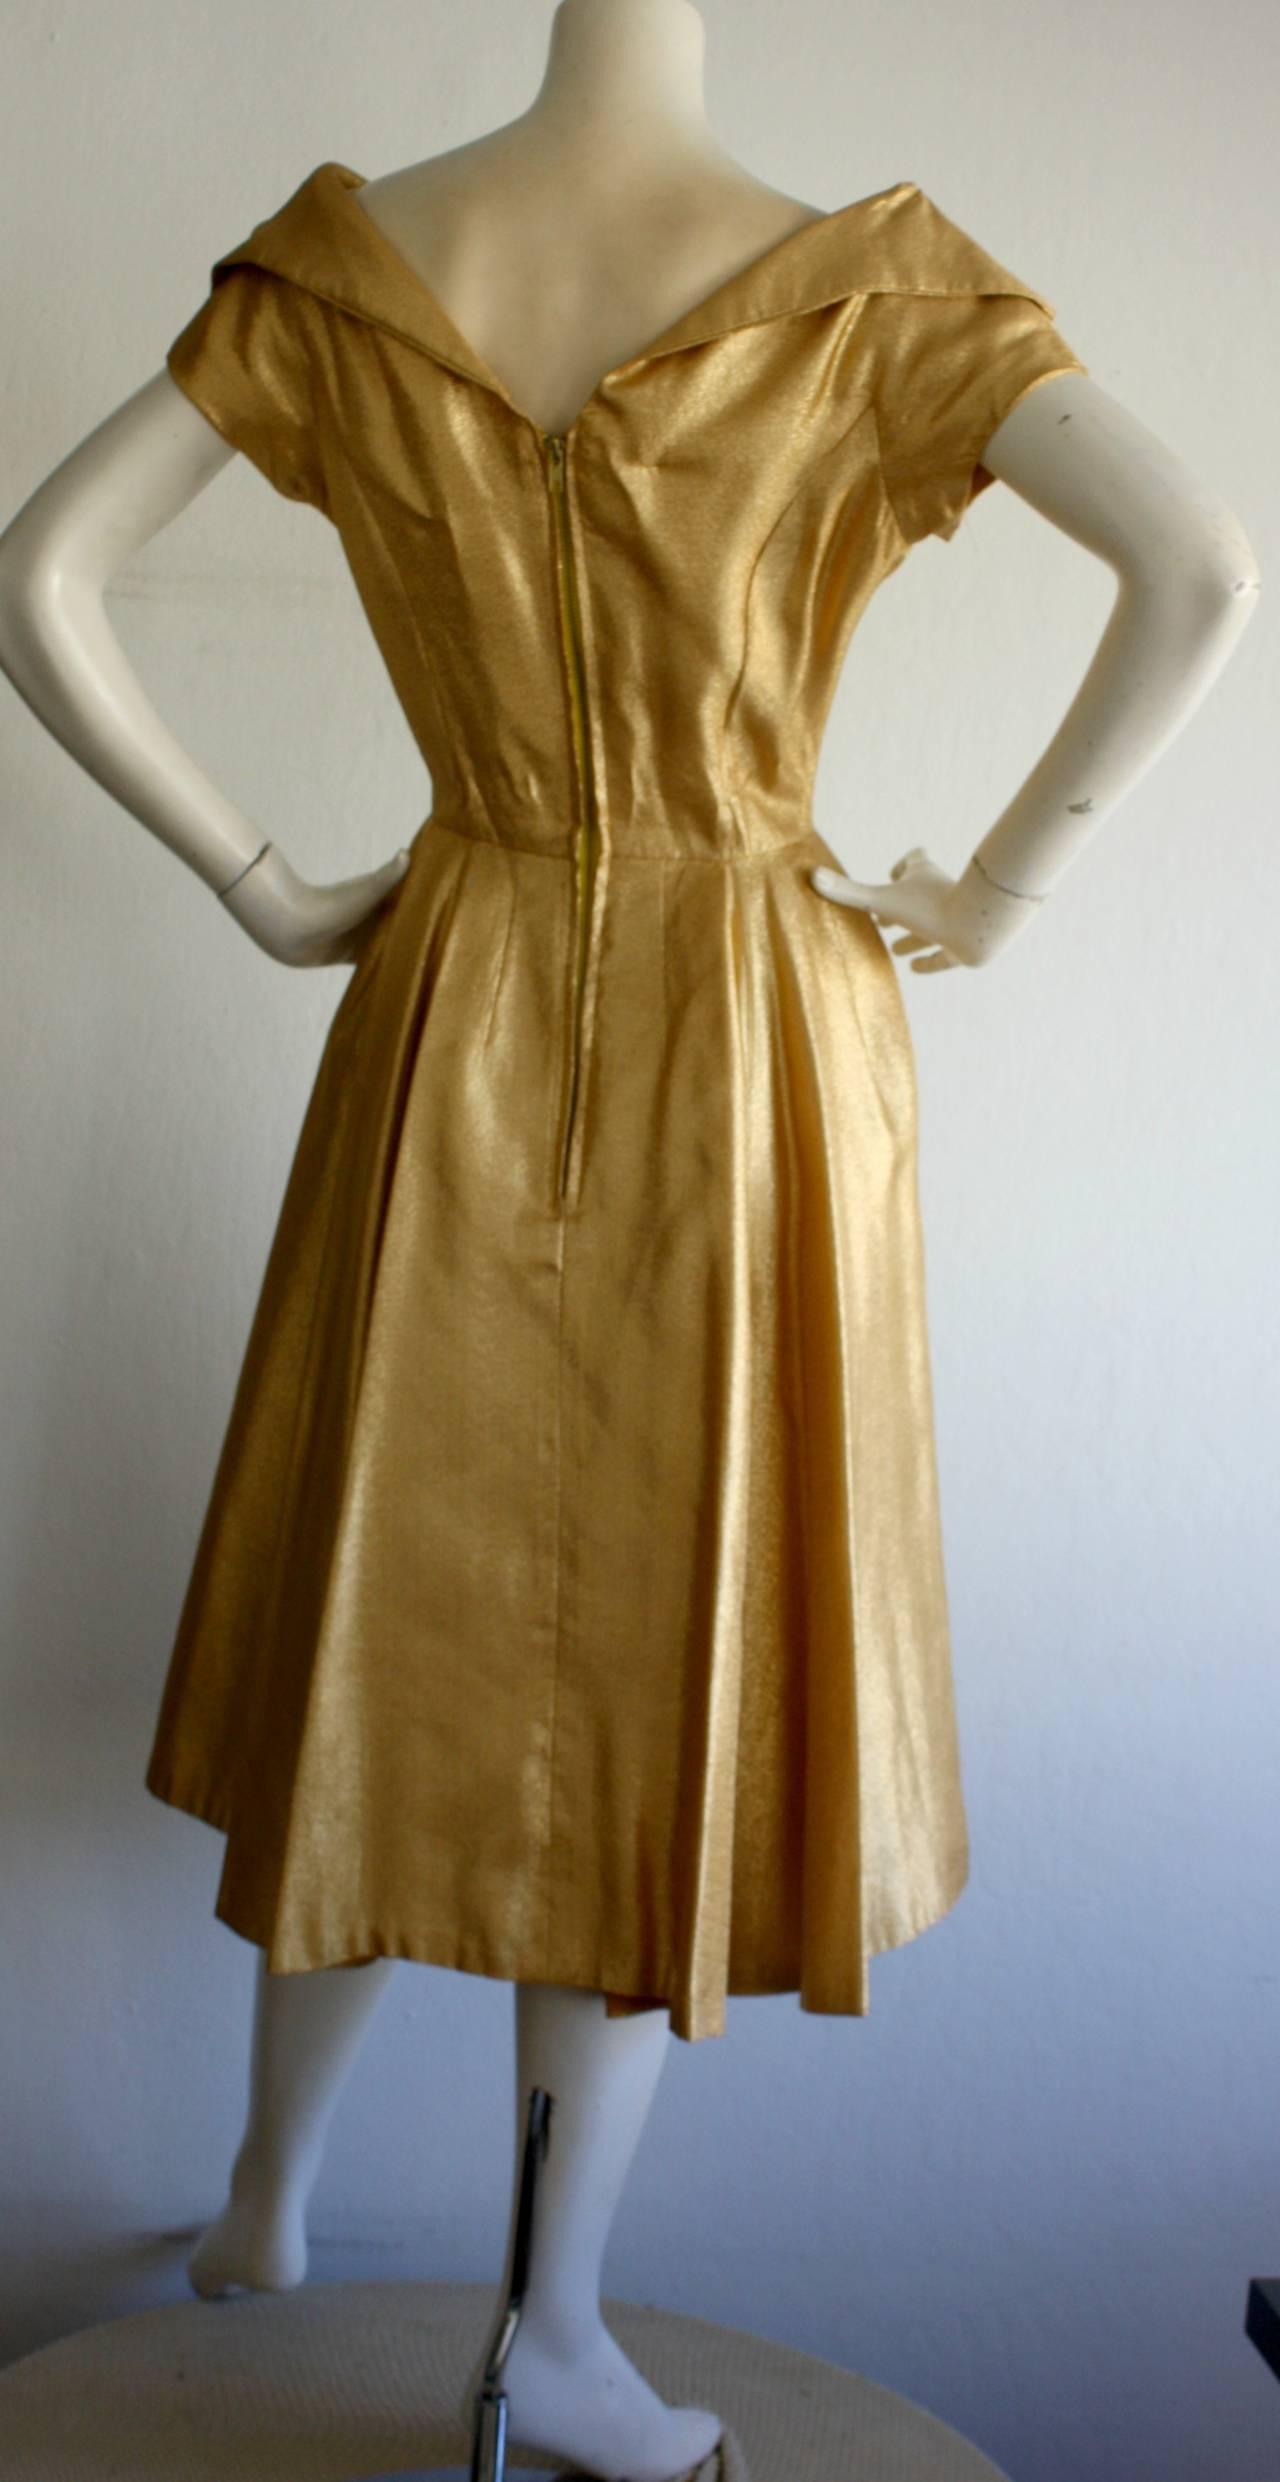 Wonderful 1950s Gold Metallic Vintage Cocktail Dress w/ Full Skirt 5